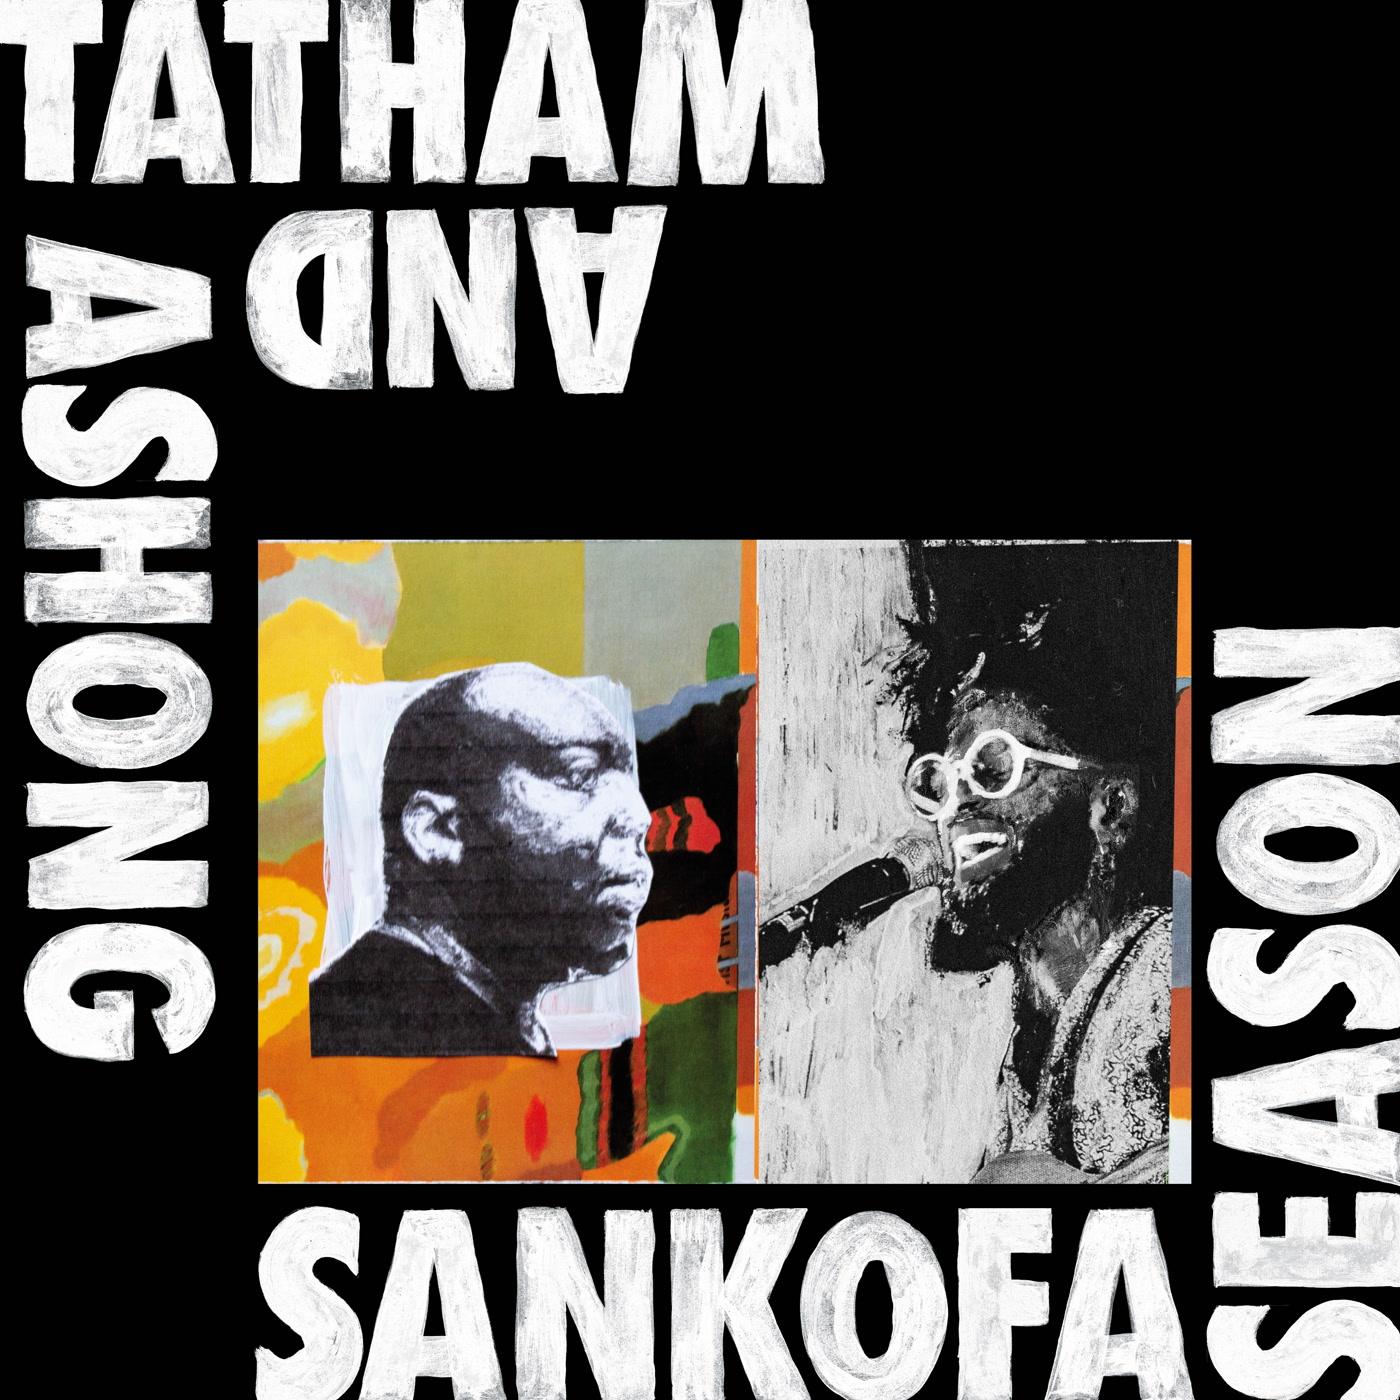 Andrew Ashong & Kaidi Tatham – Sankofa Season (Kitto Records)